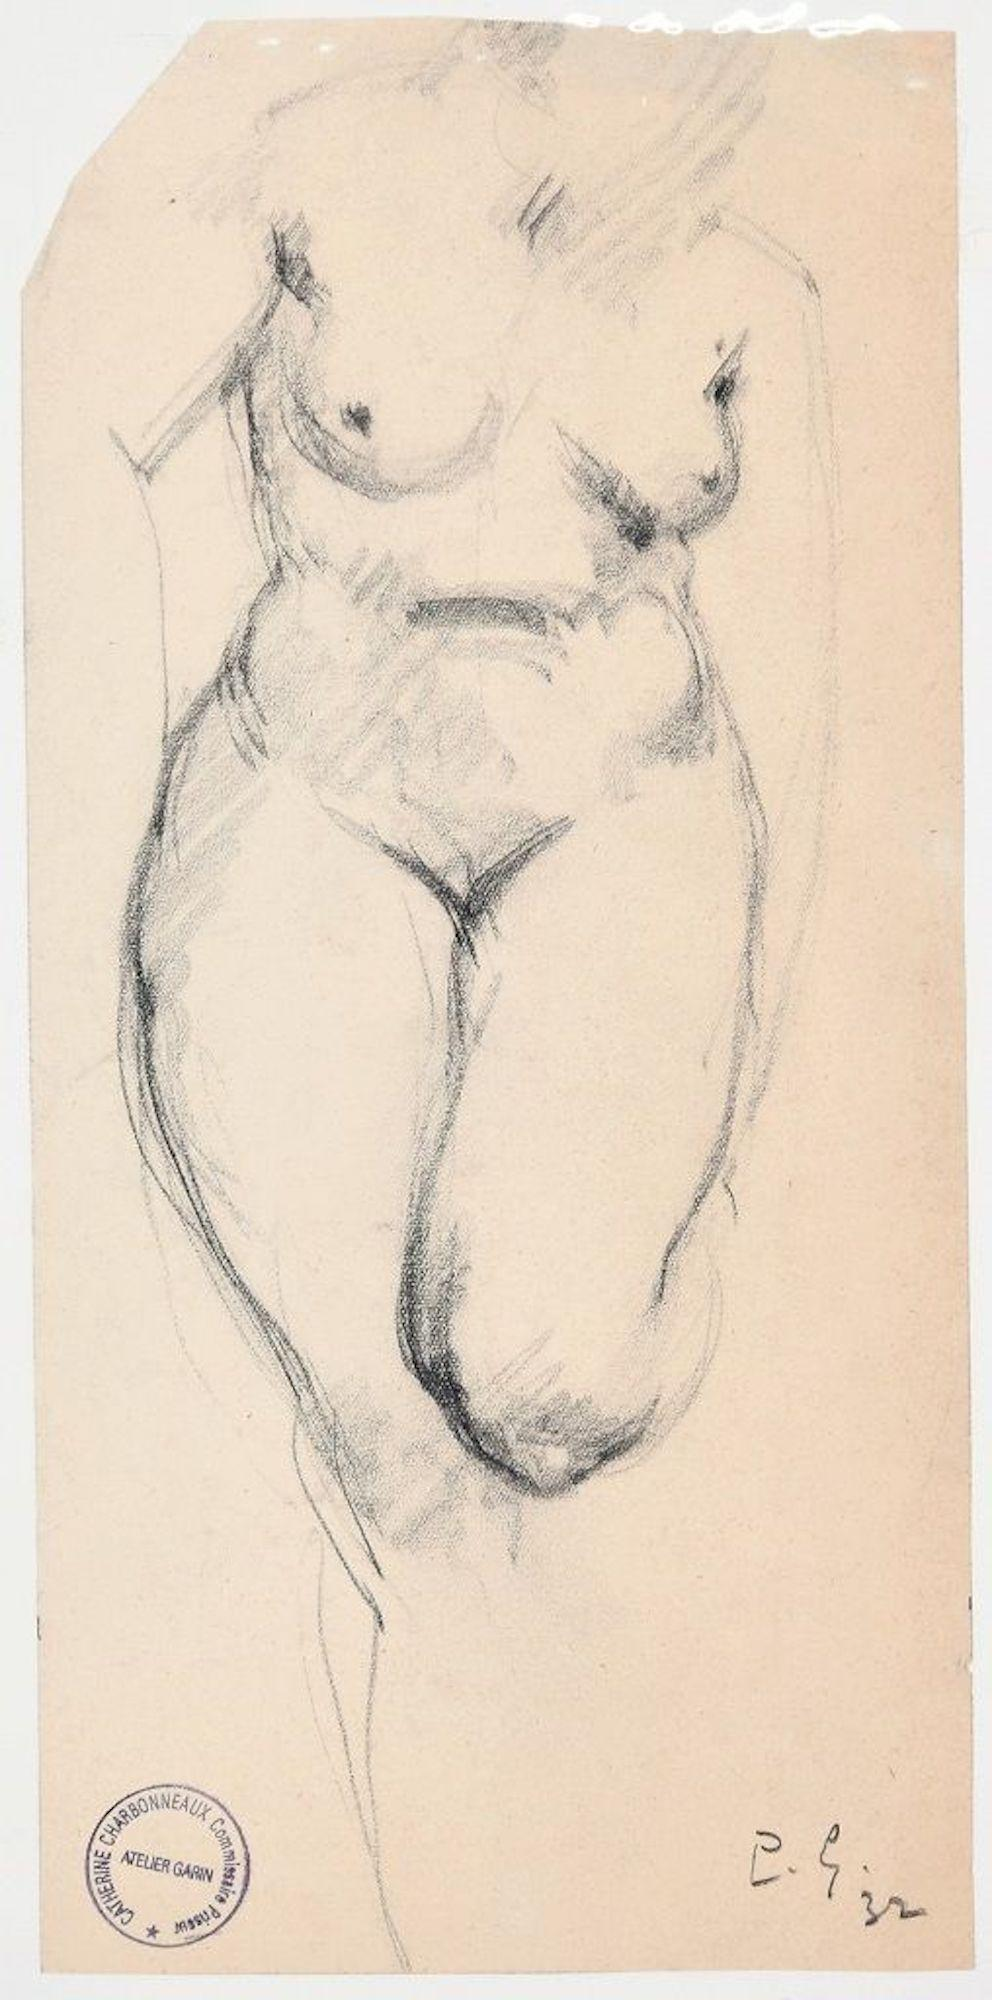 Woman's Nude - Original Charcoal Drawing by Paul Garin - 1932